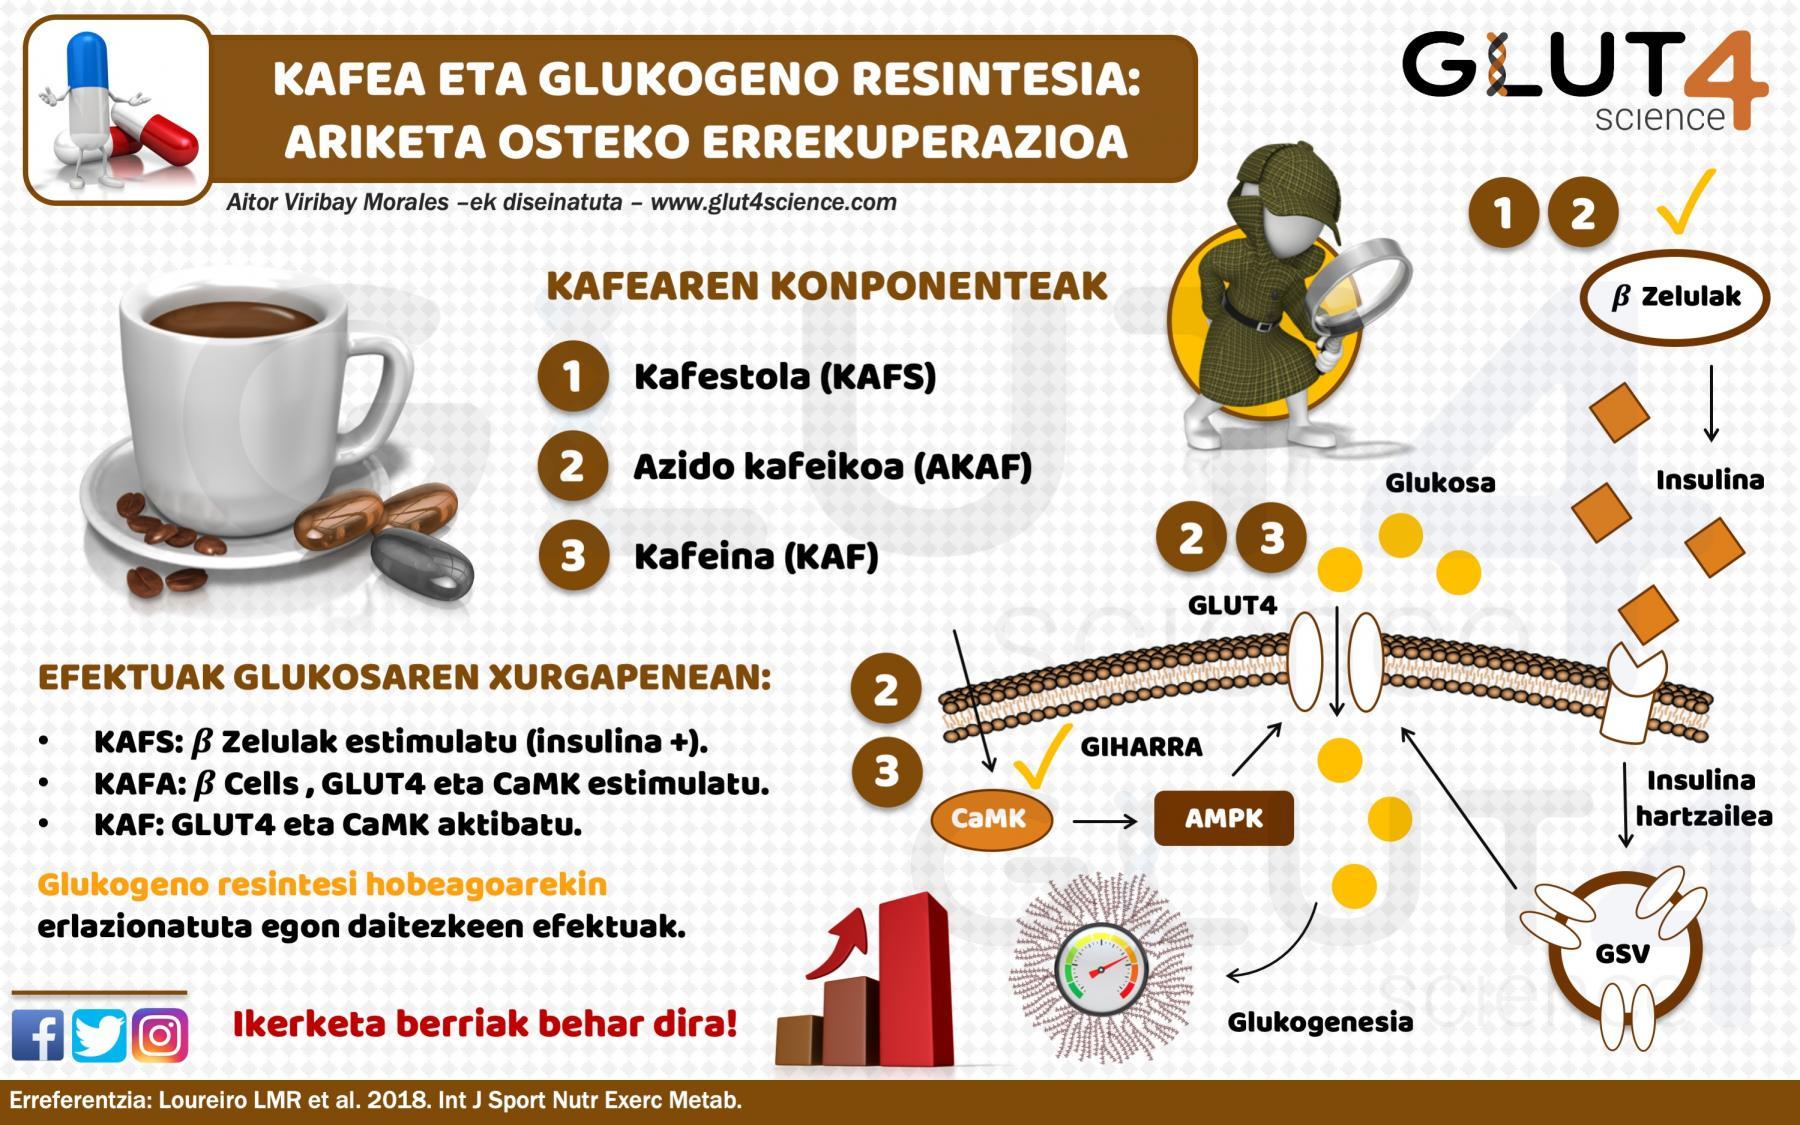 Kafea eta glukogeno resintesia